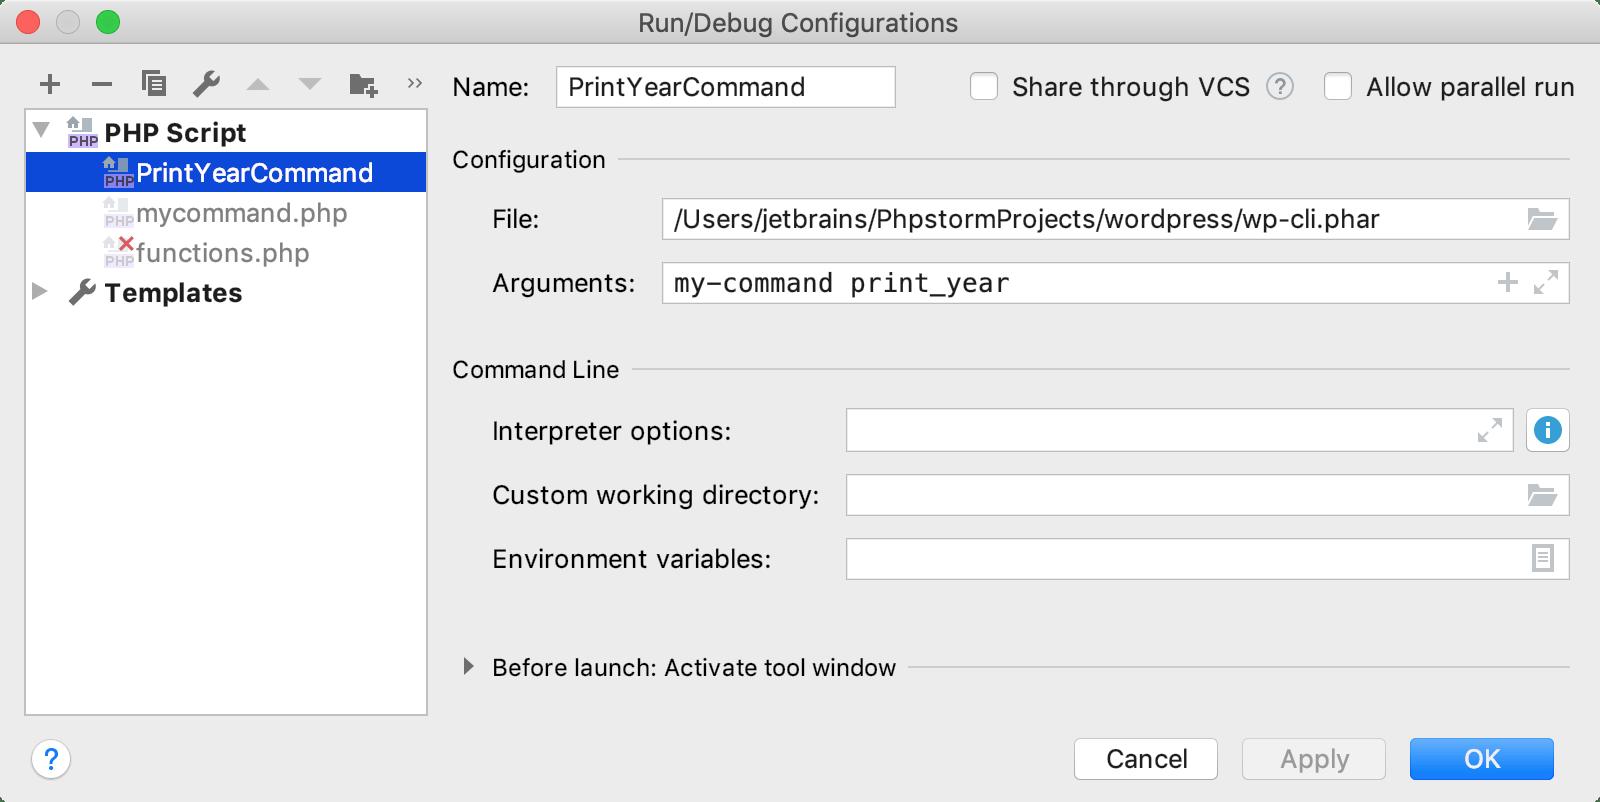 Run/Debug Configurations dialog for Wordpress CLI command